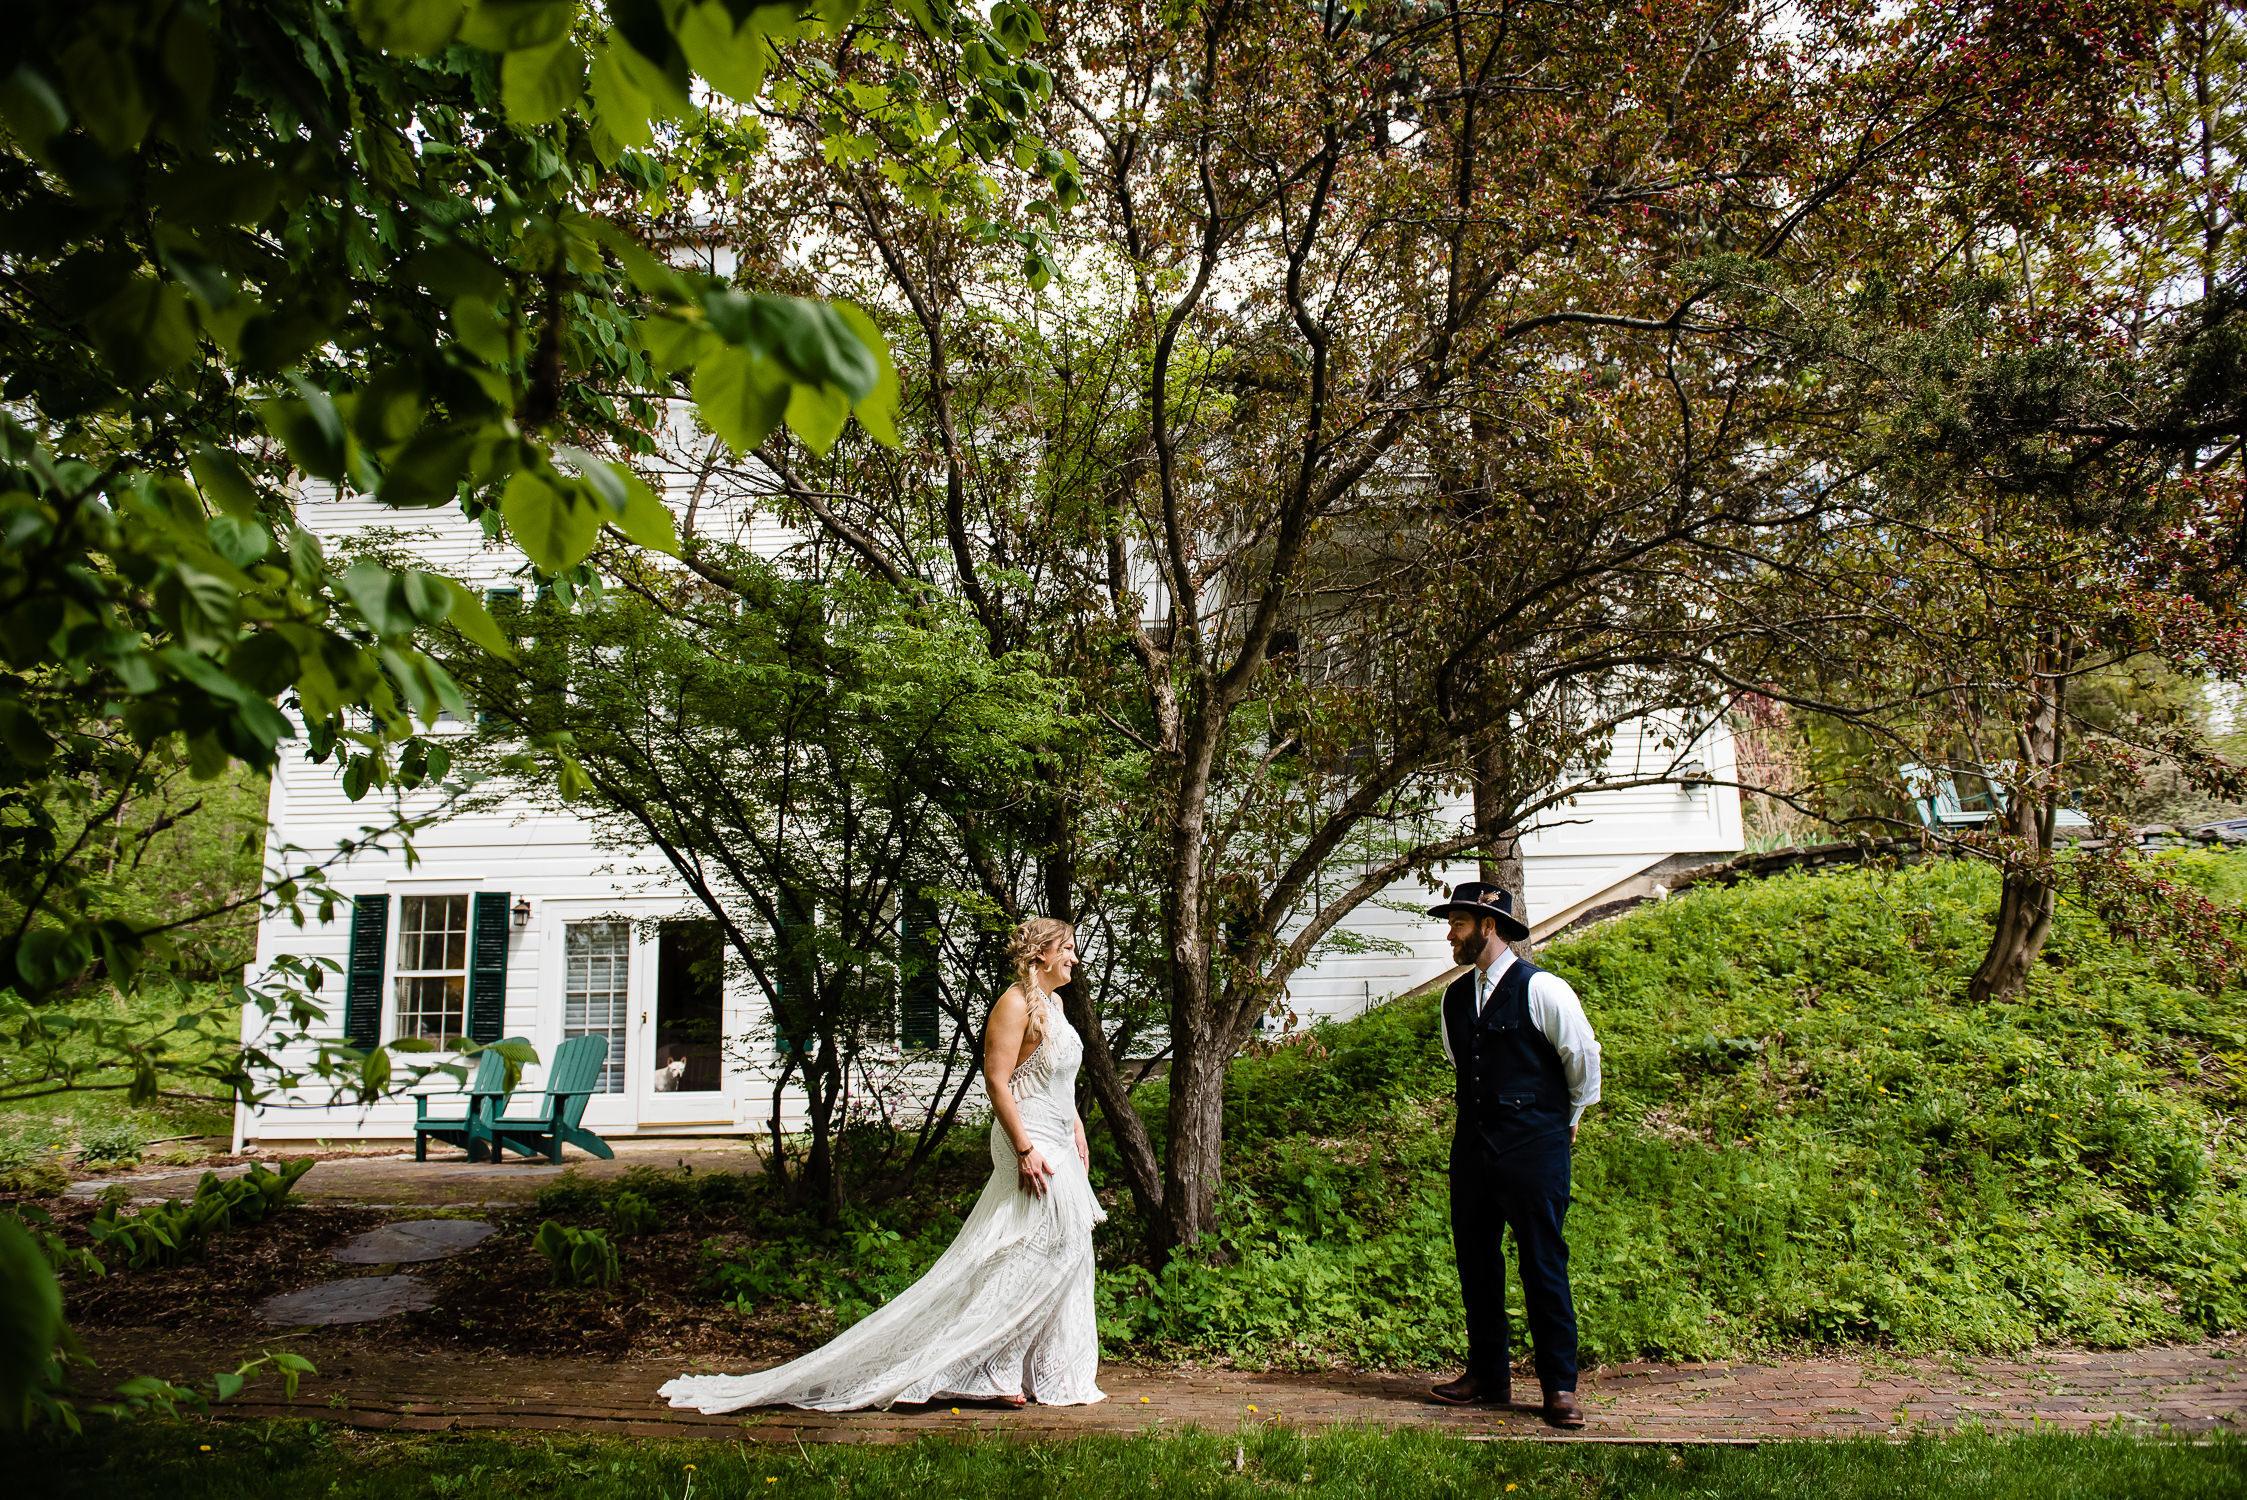 tourterelle-vermont-wedding-photographers-007-2-2247x1500.jpg